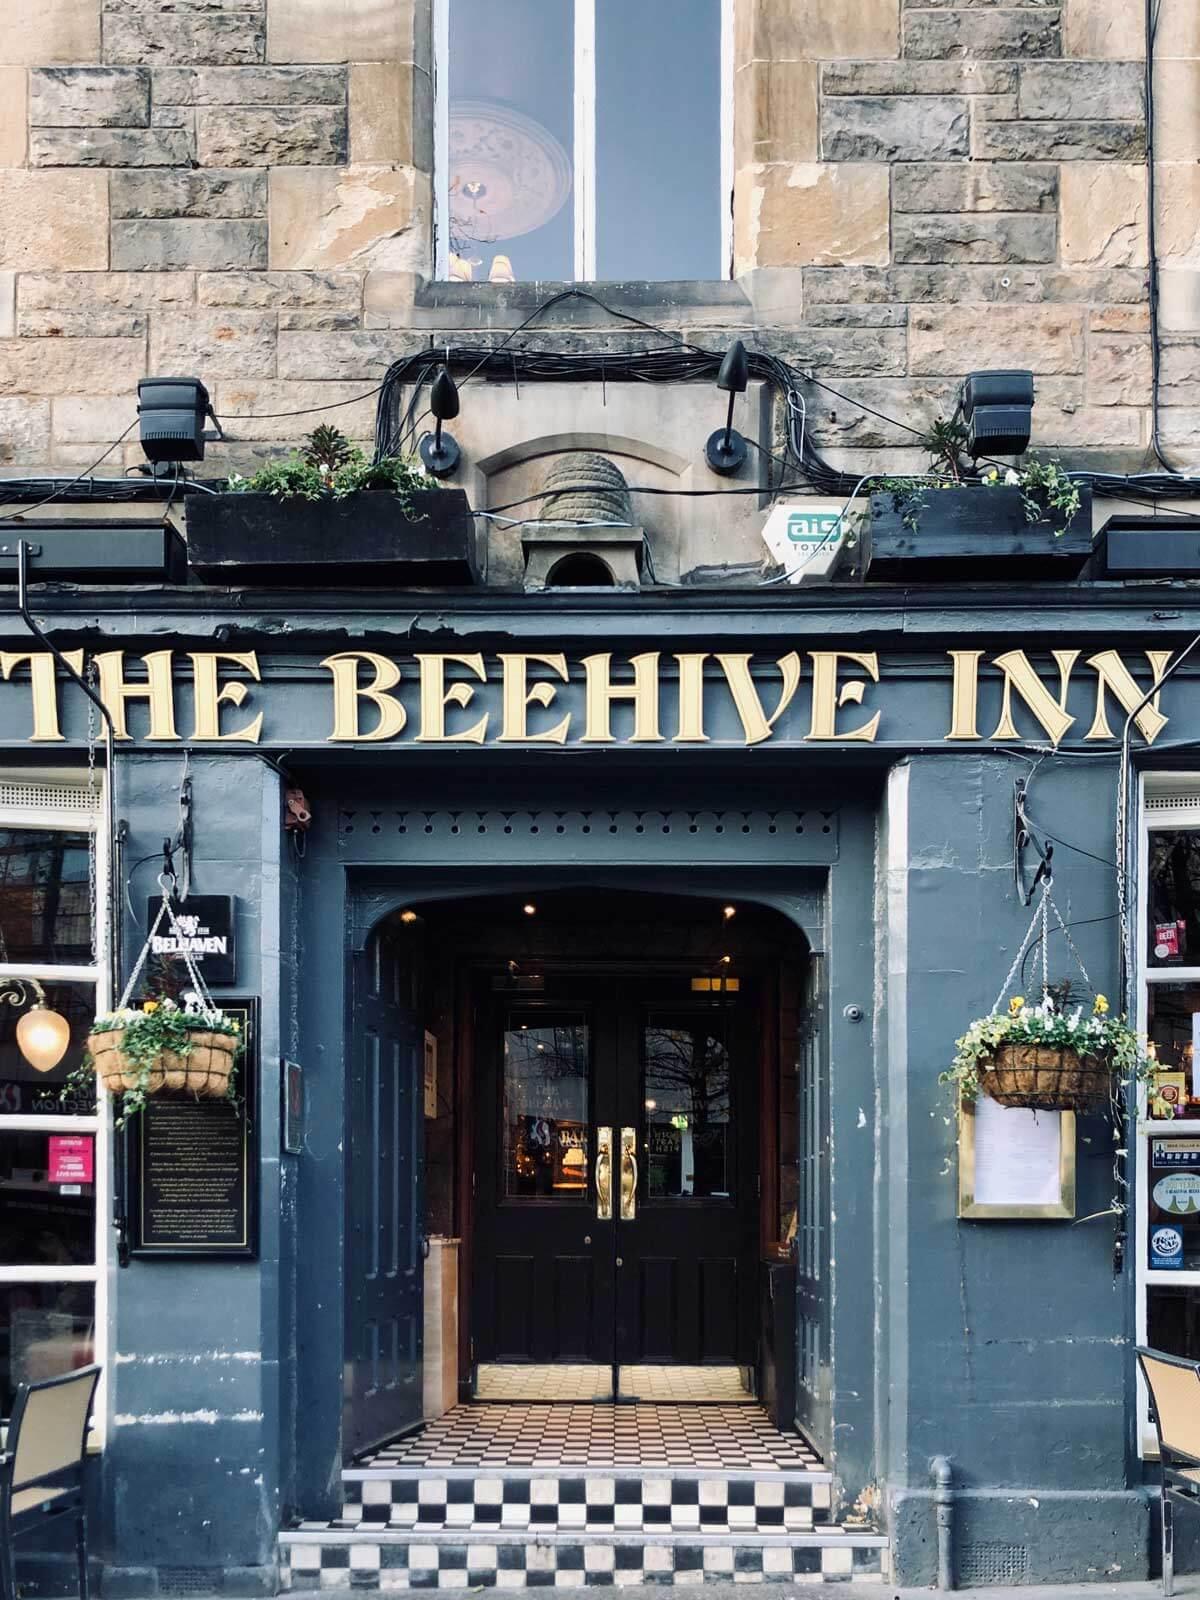 The-Beehive-Inn-in-Grassmarket-Edinburgh-pub-crawl